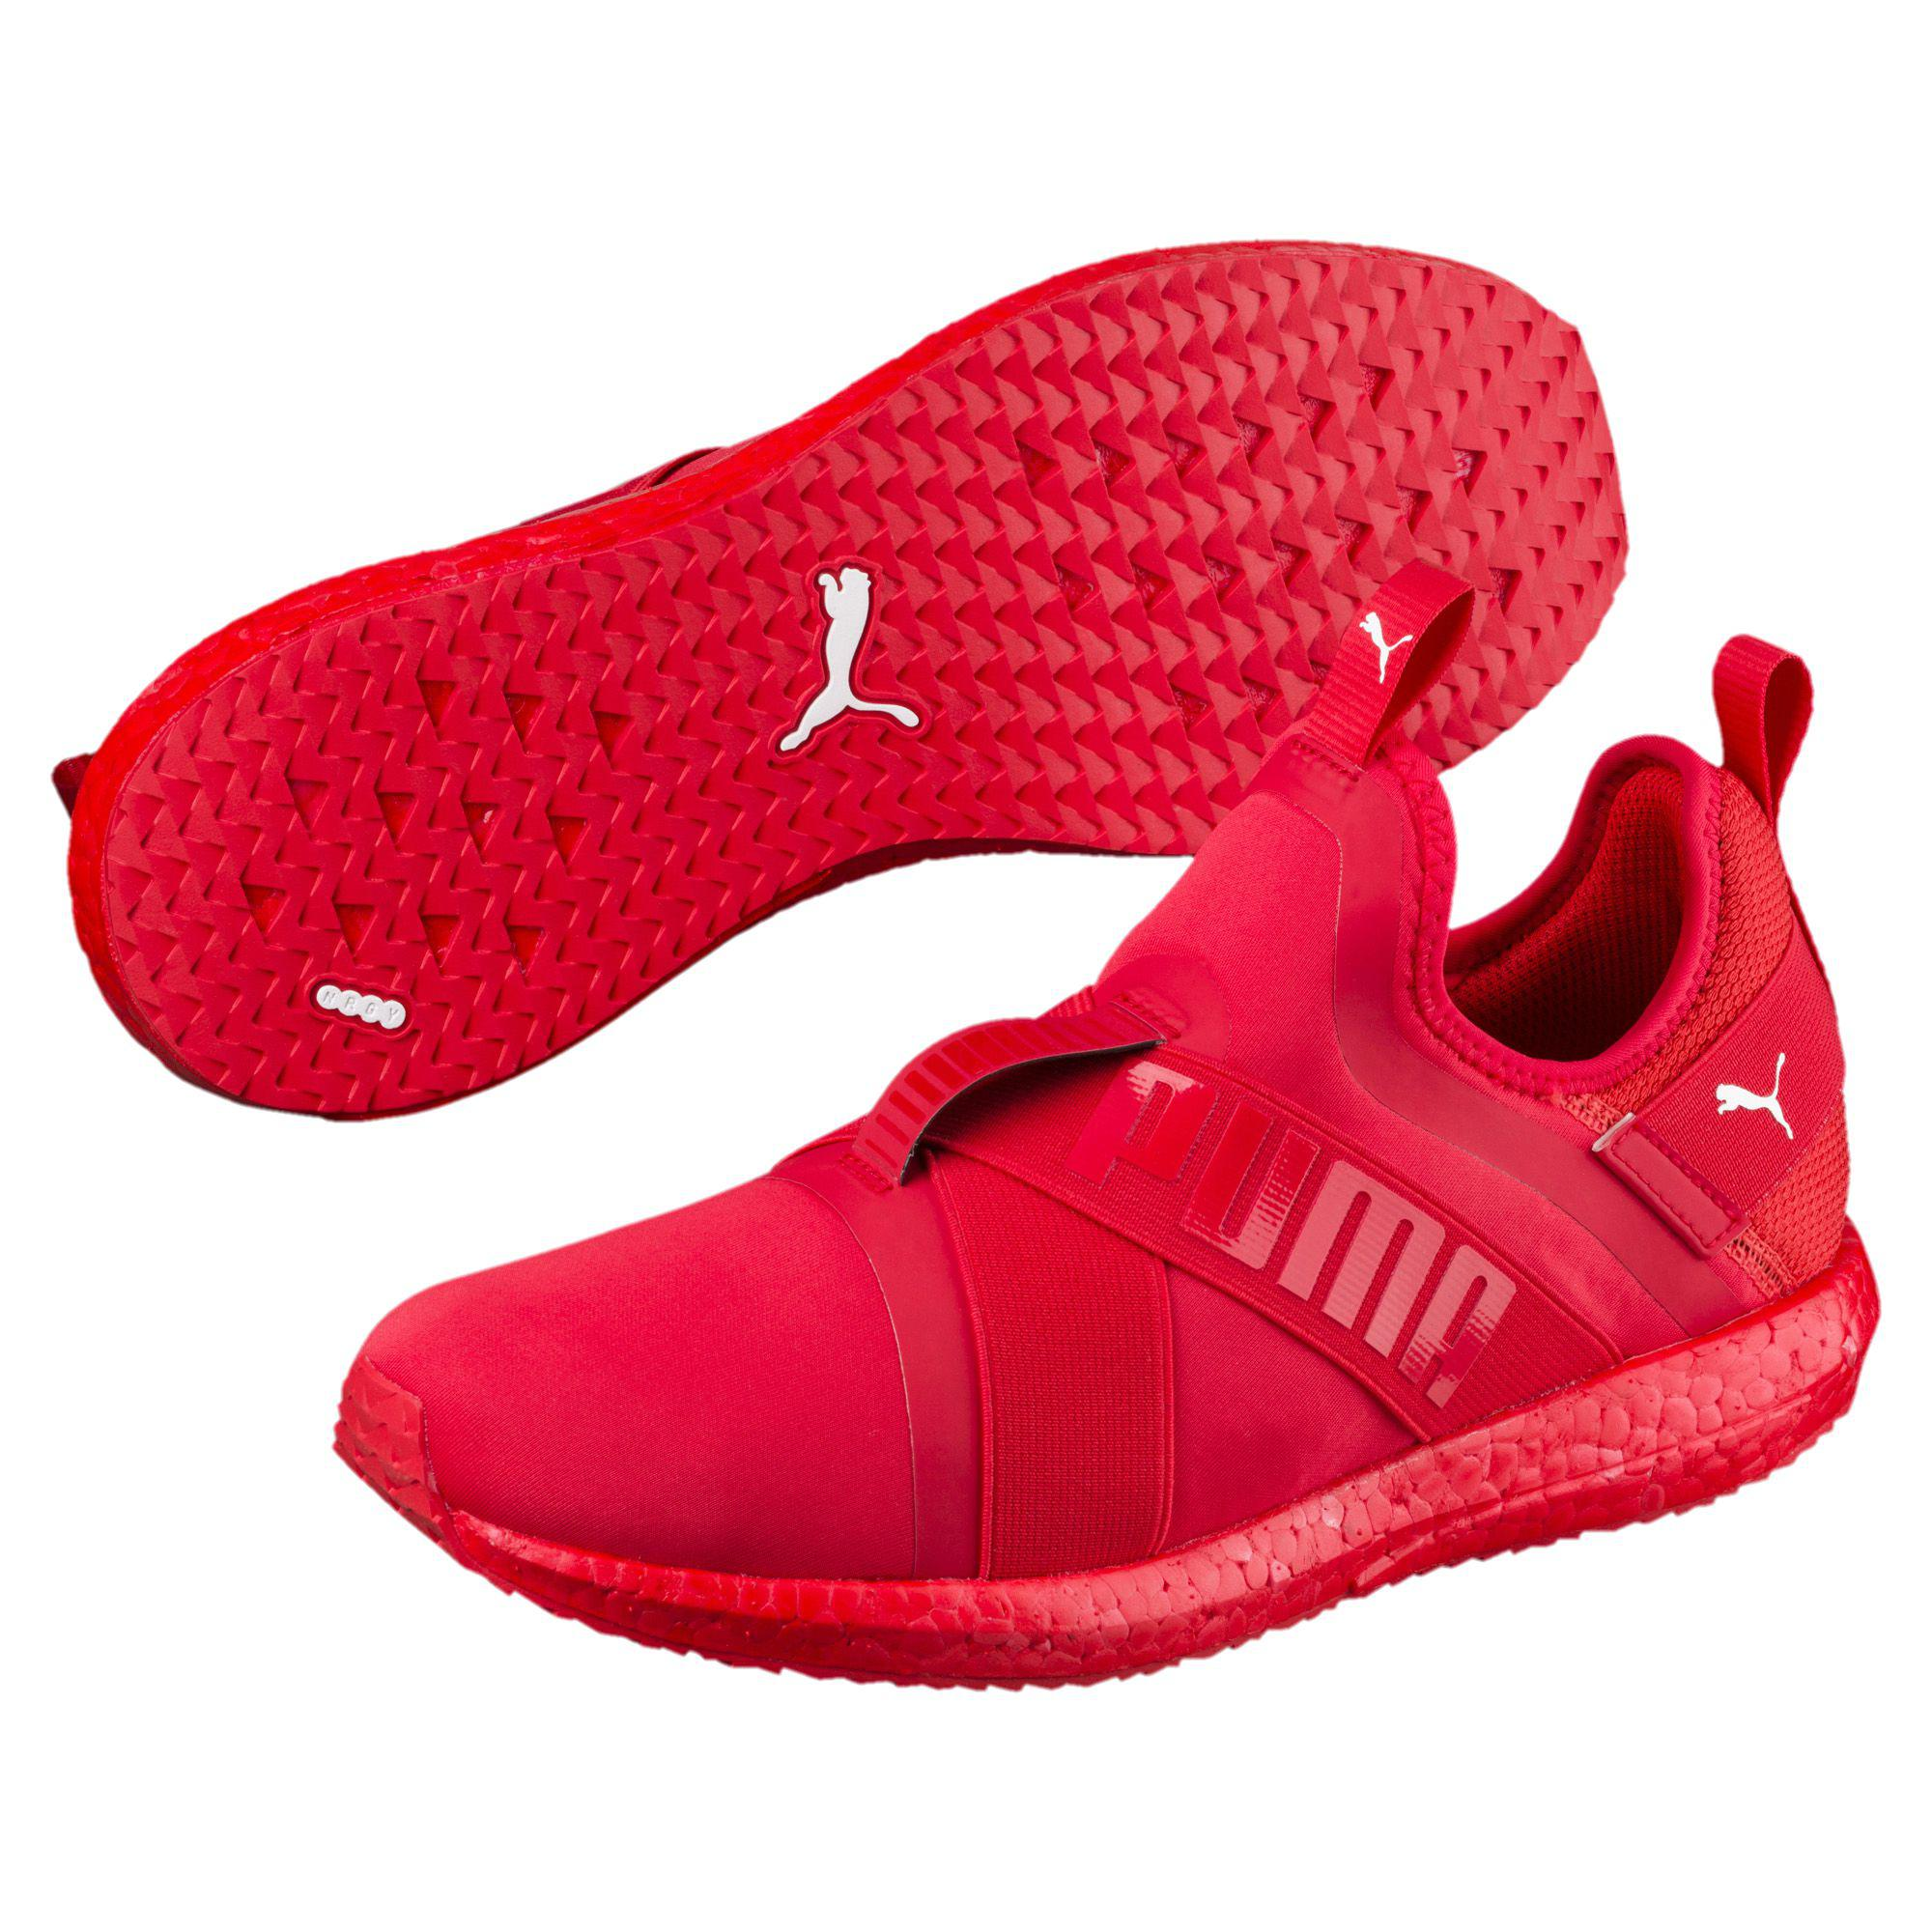 Official Puma Store: PUMA Mega NRGY Heather Knit Men's Running Shoes Men Shoe Running  